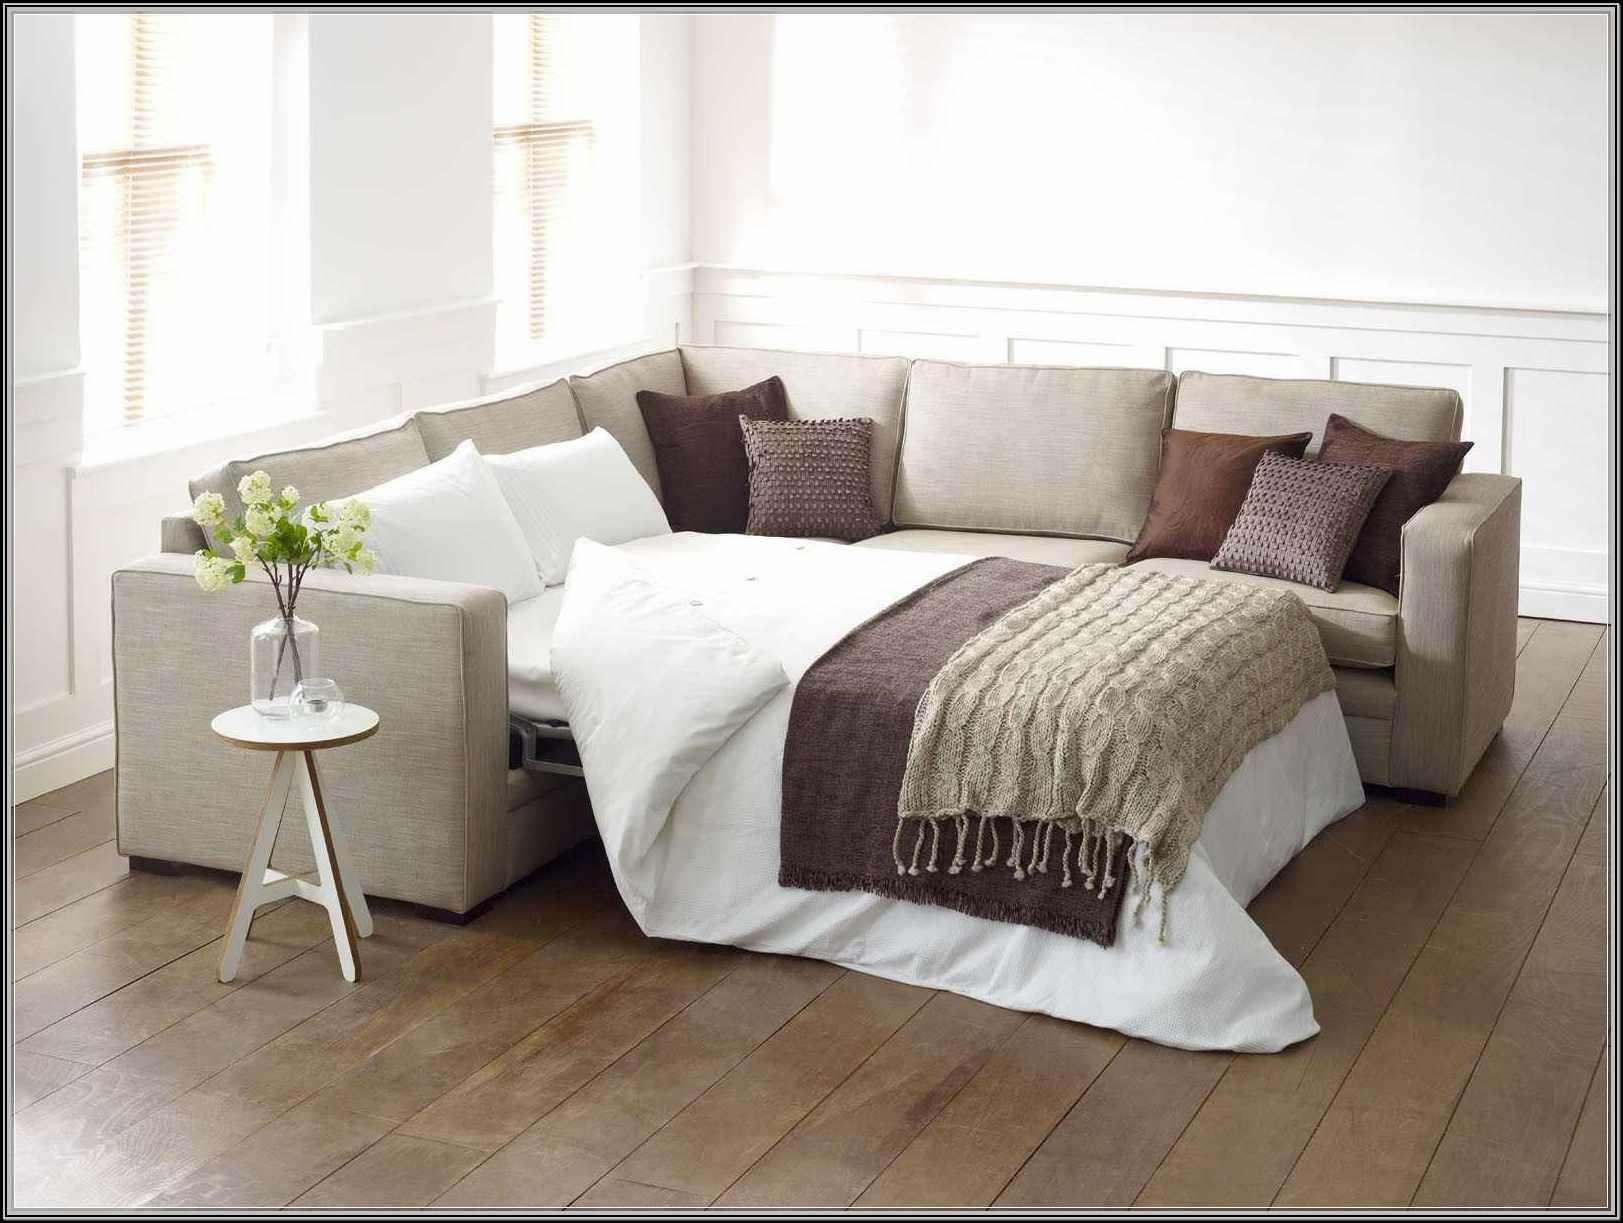 Furniture: Comfortable Modular Sectional Sofa For Modern Living Within Small Modular Sectional Sofa (Image 6 of 20)